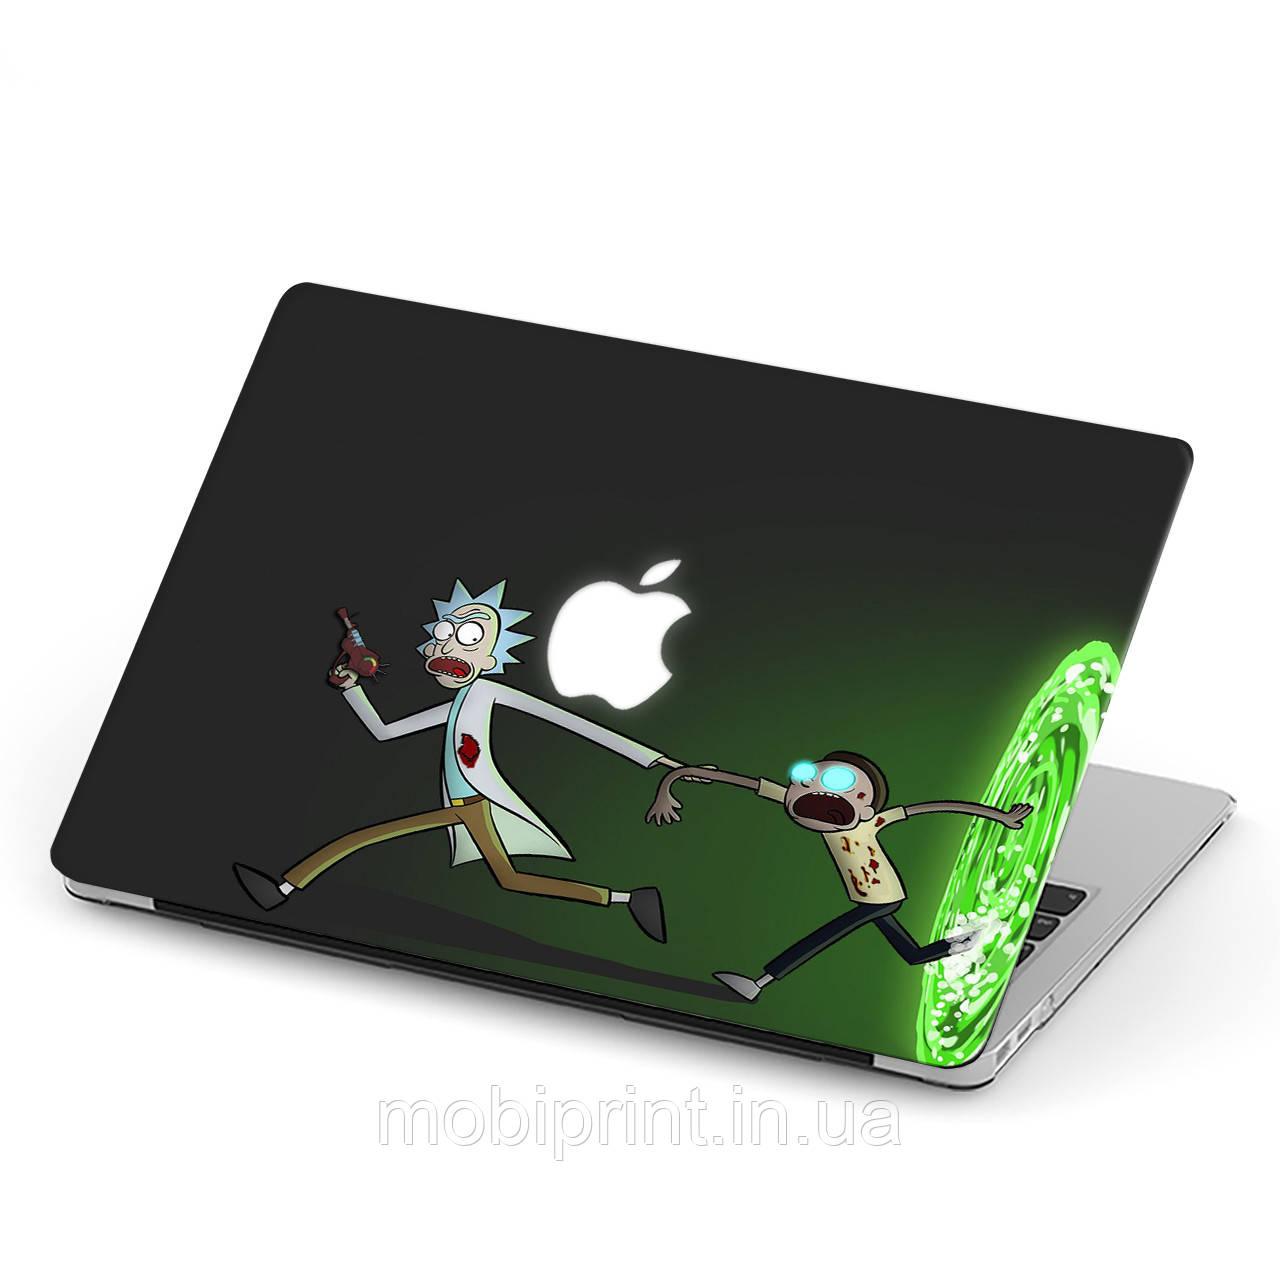 Чехол пластиковый для Apple MacBook Pro / Air Рик и Морти (Rick and Morty) макбук про case hard cover